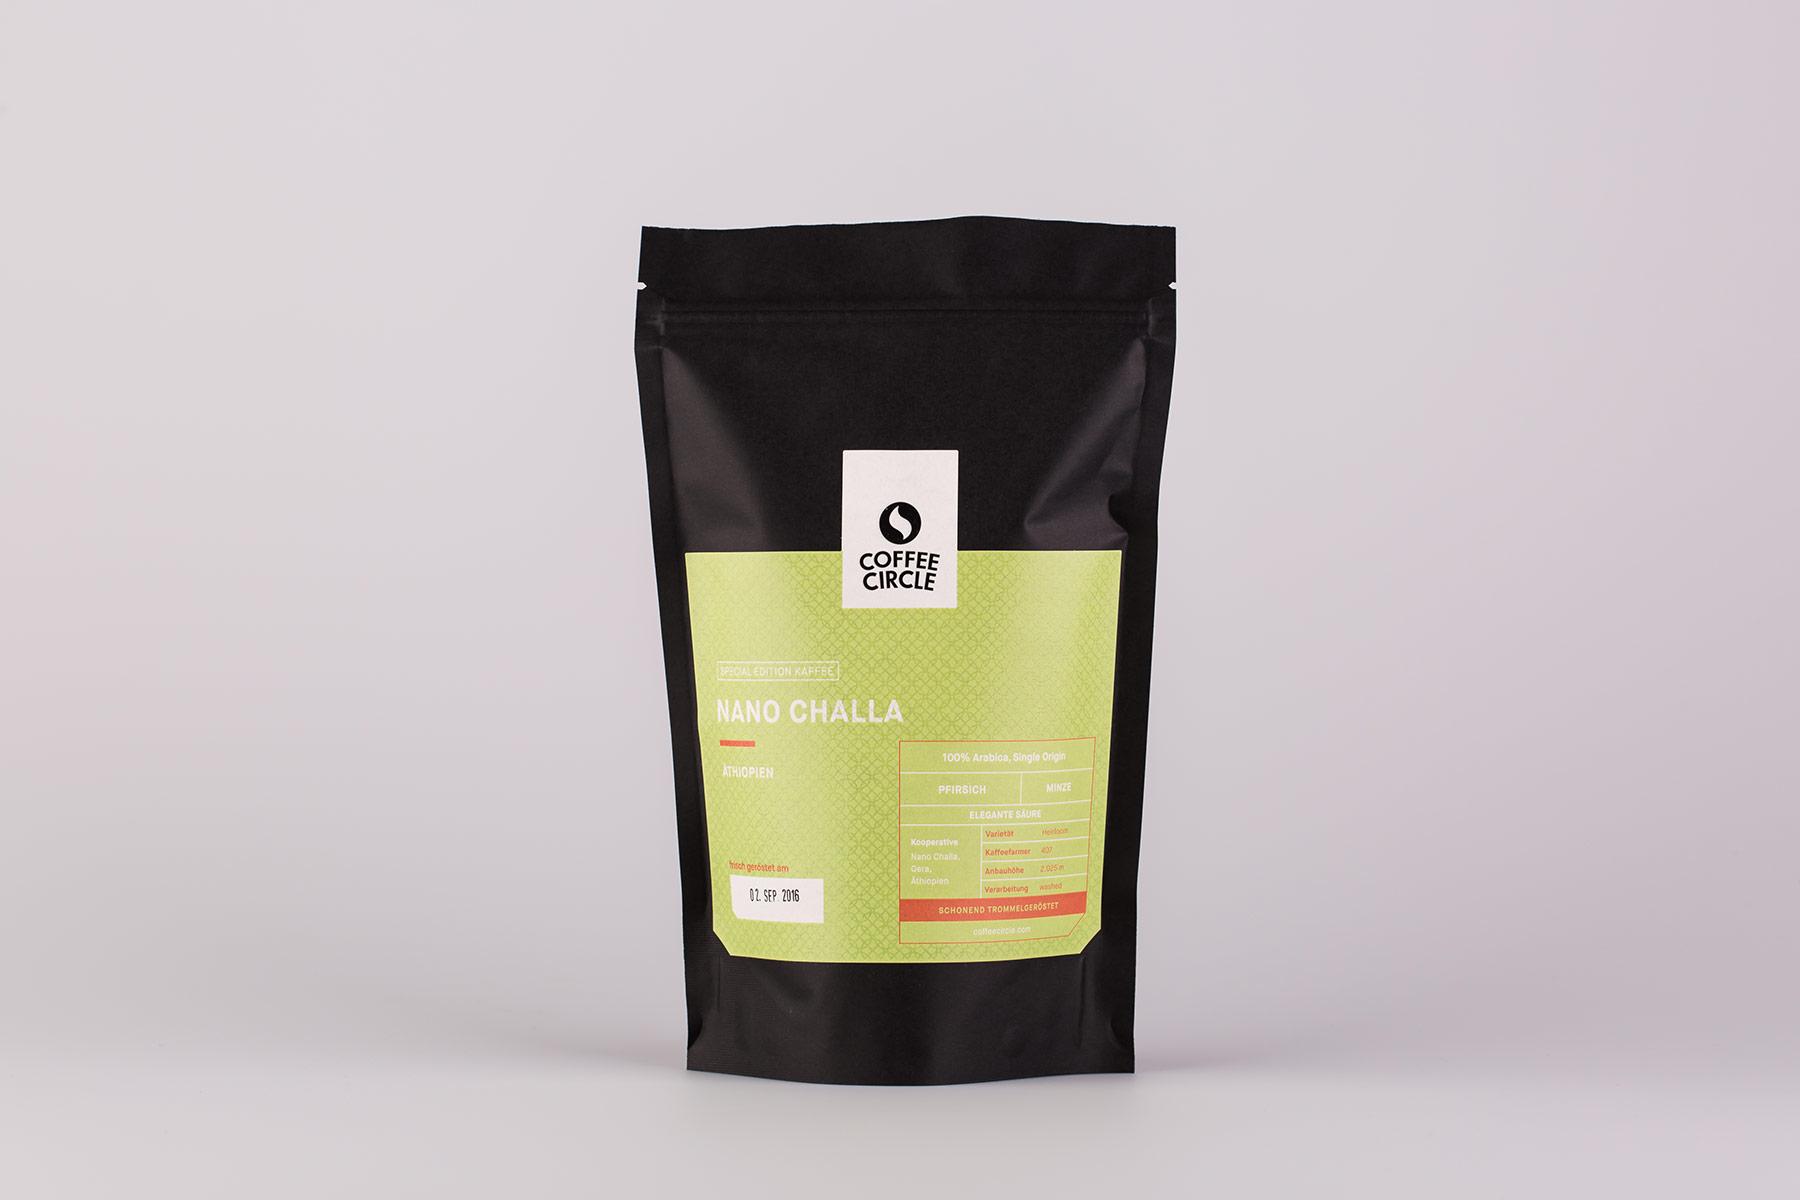 max-duchardt-m-a-a-x-coffeecircle-packaging-design-nano-challa